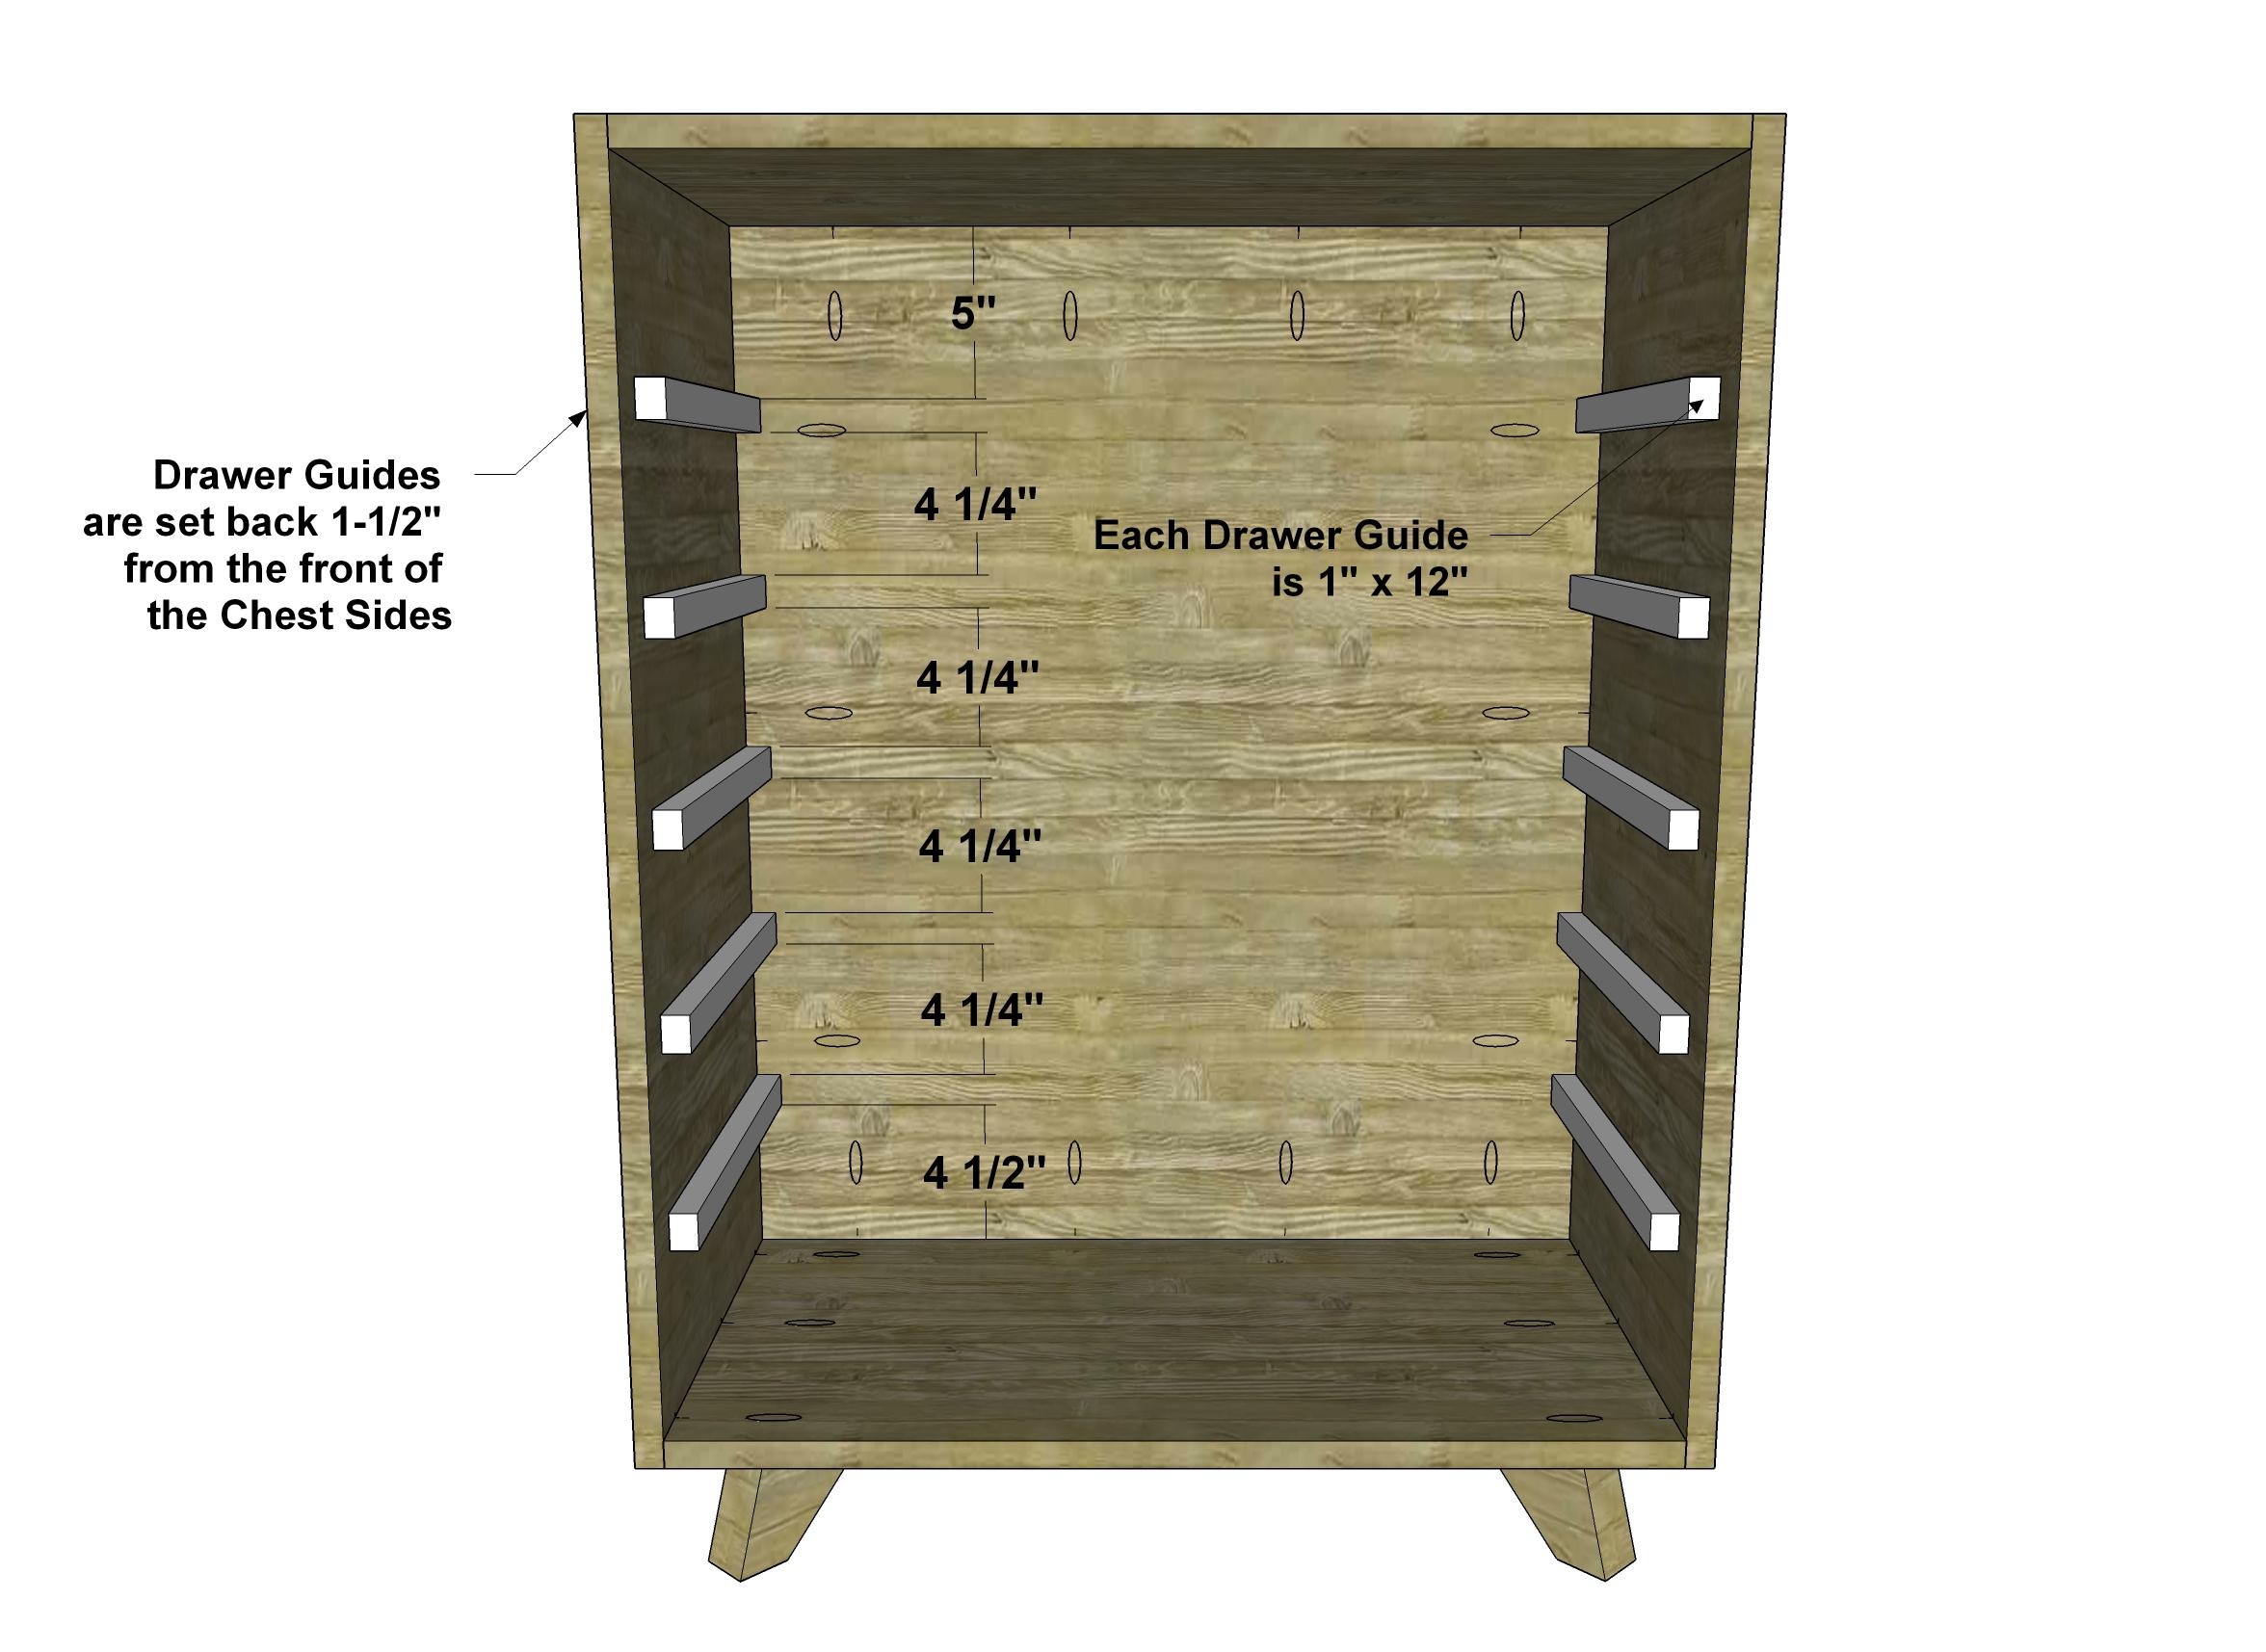 Diy Furniture Plans To Build A Steppe Tallboy Dresser The